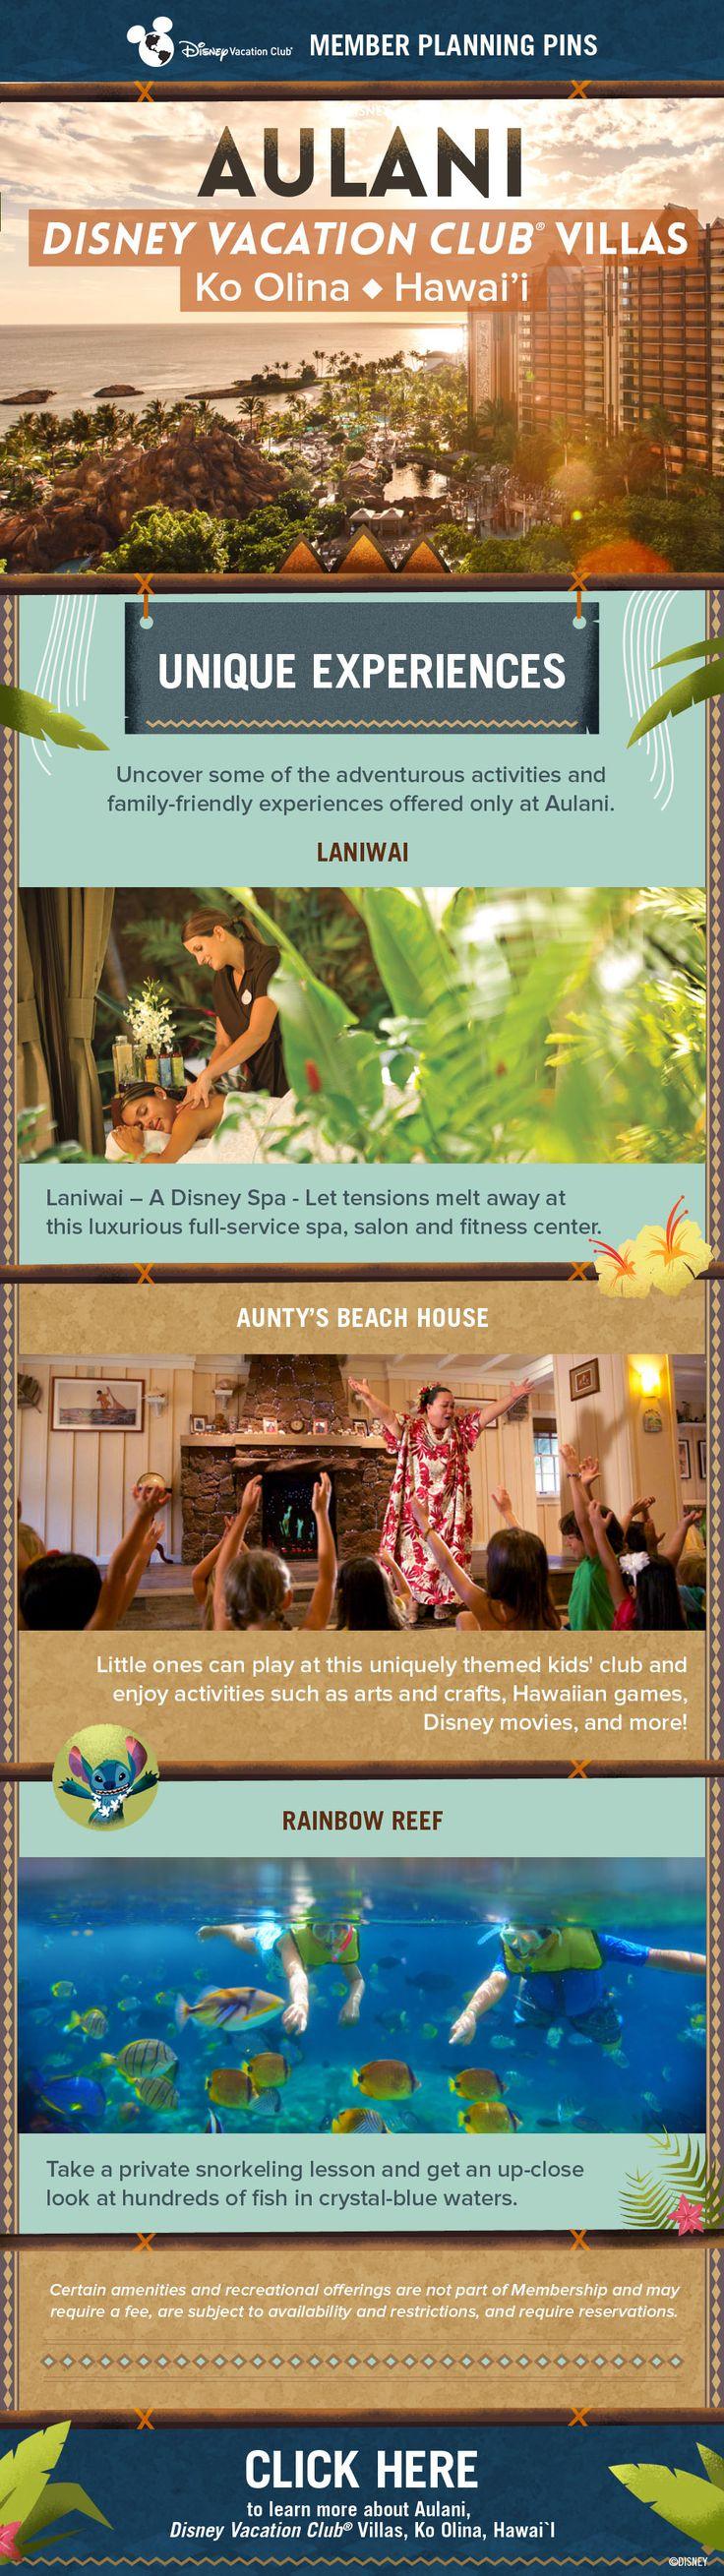 Aulani Disney Vacation Club Villas Ko Olina